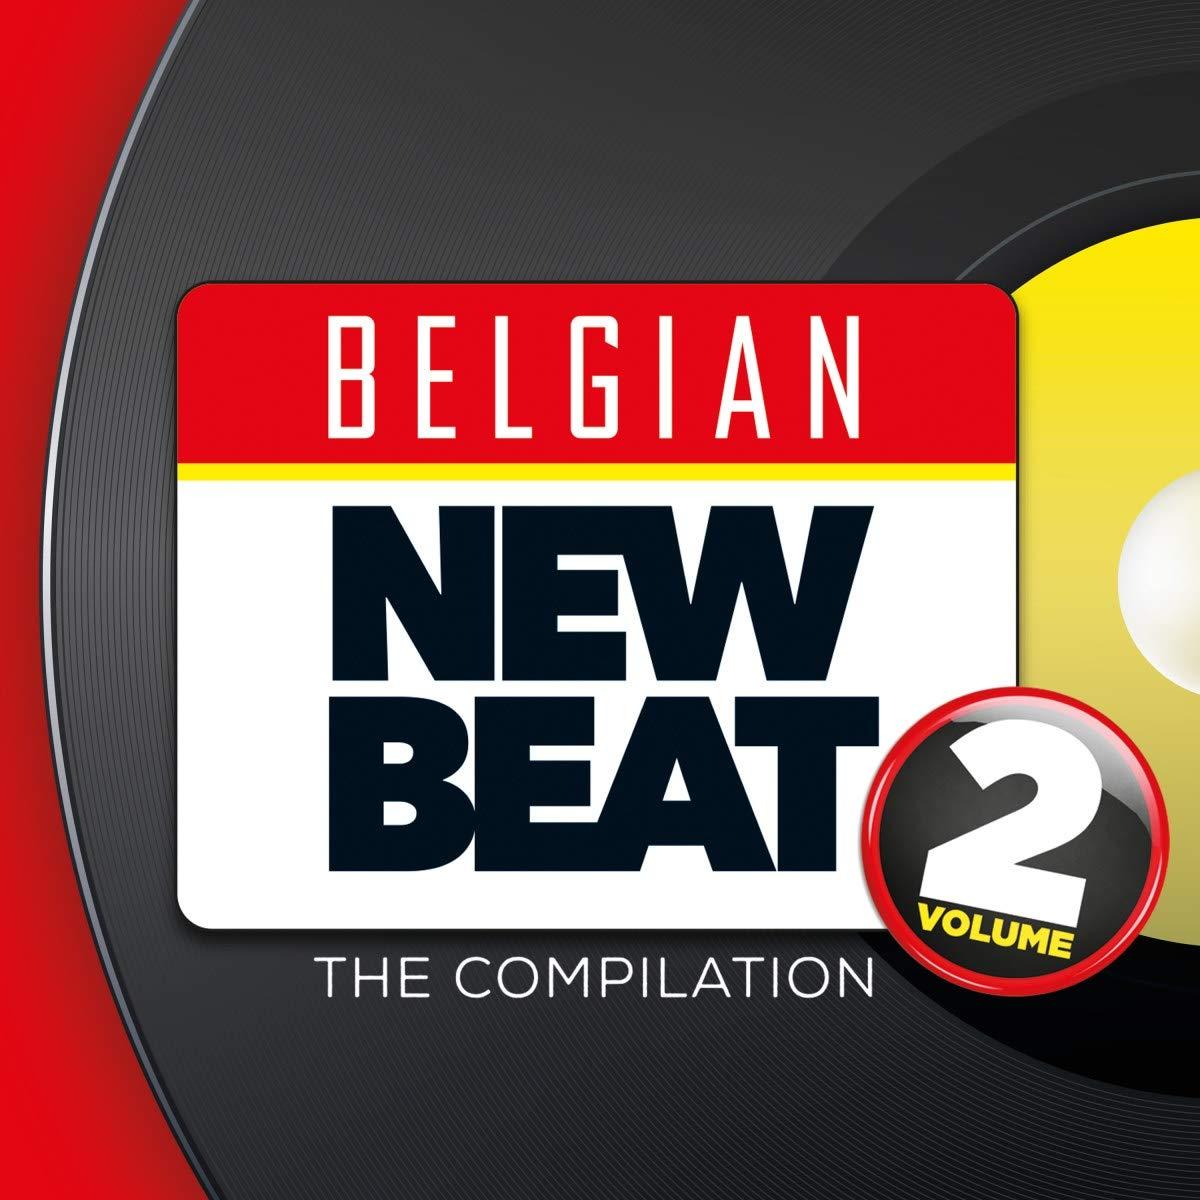 CD : VARIOUS ARTISTS - Belgian New Beat Volume 2 (4 Pack)